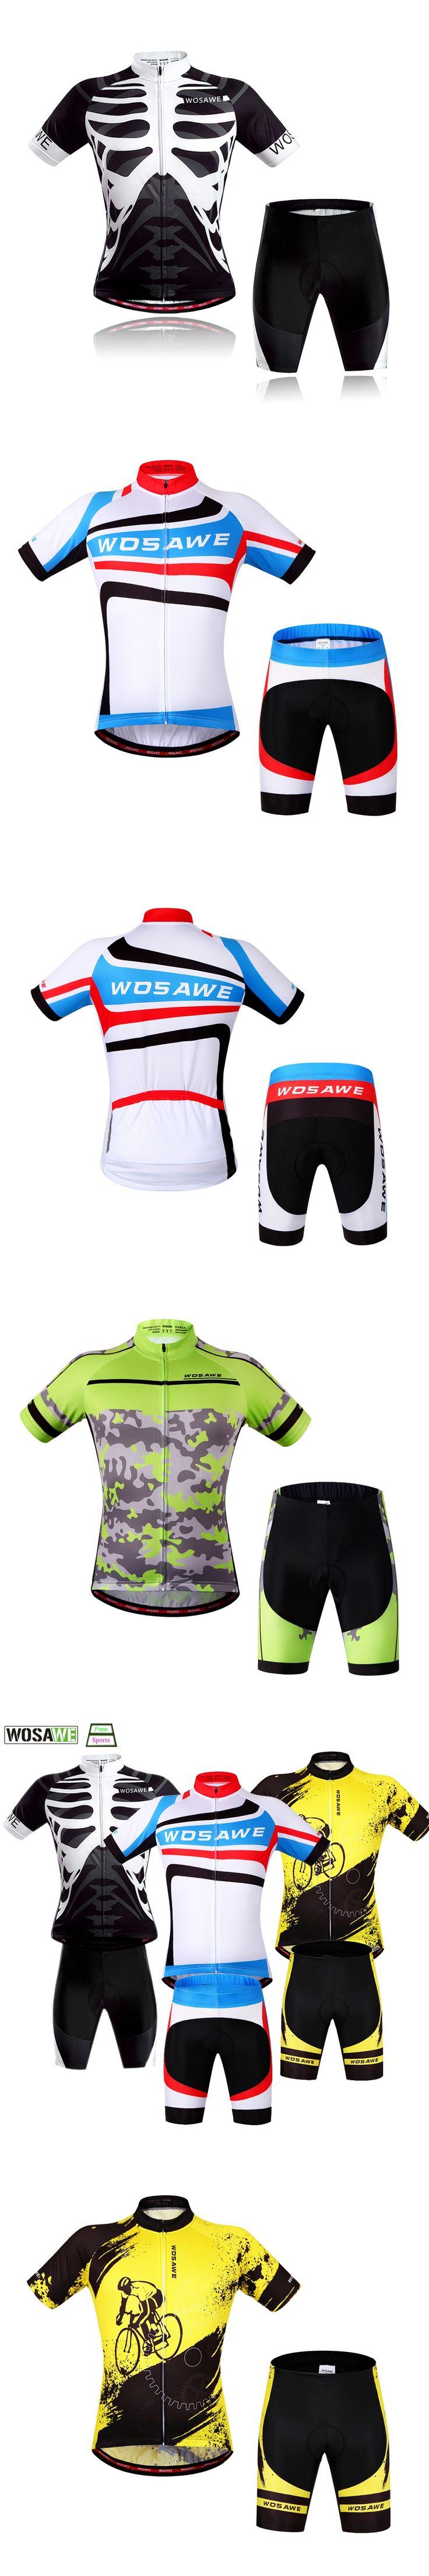 WOSAWE Cycling Clothing Quick Drying Cycling Jersey Set MTB Bike Mountain Shirt Shorts Riding Team Bicycle Motocross Cloth